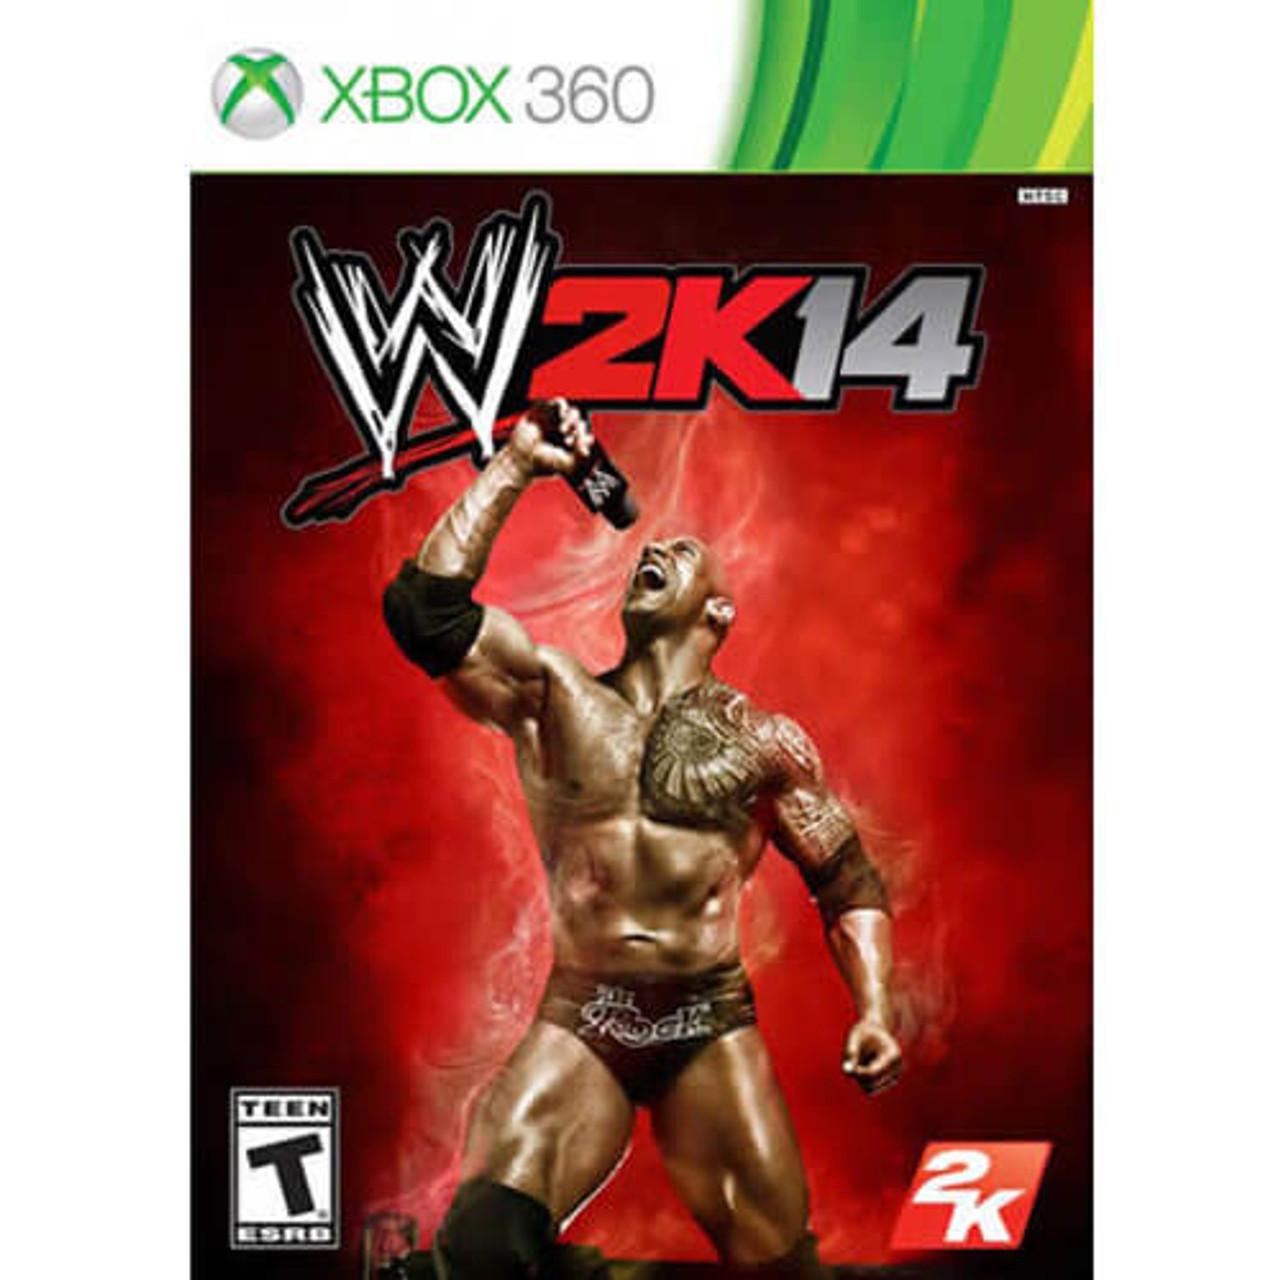 WWE 2K14 - Xbox 360 Game